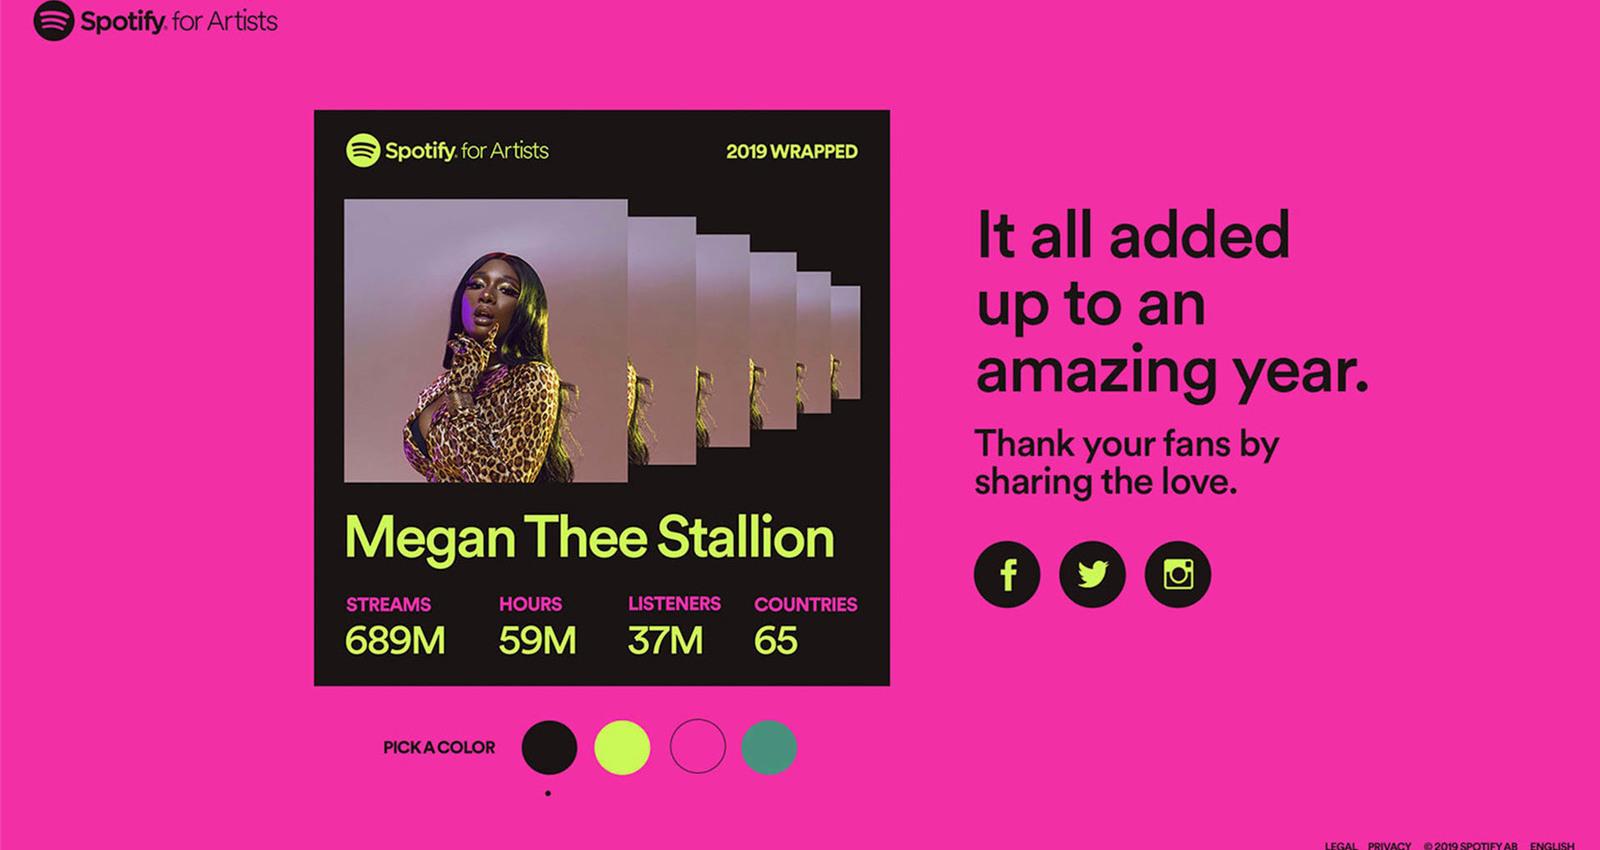 #SpotifyWrapped